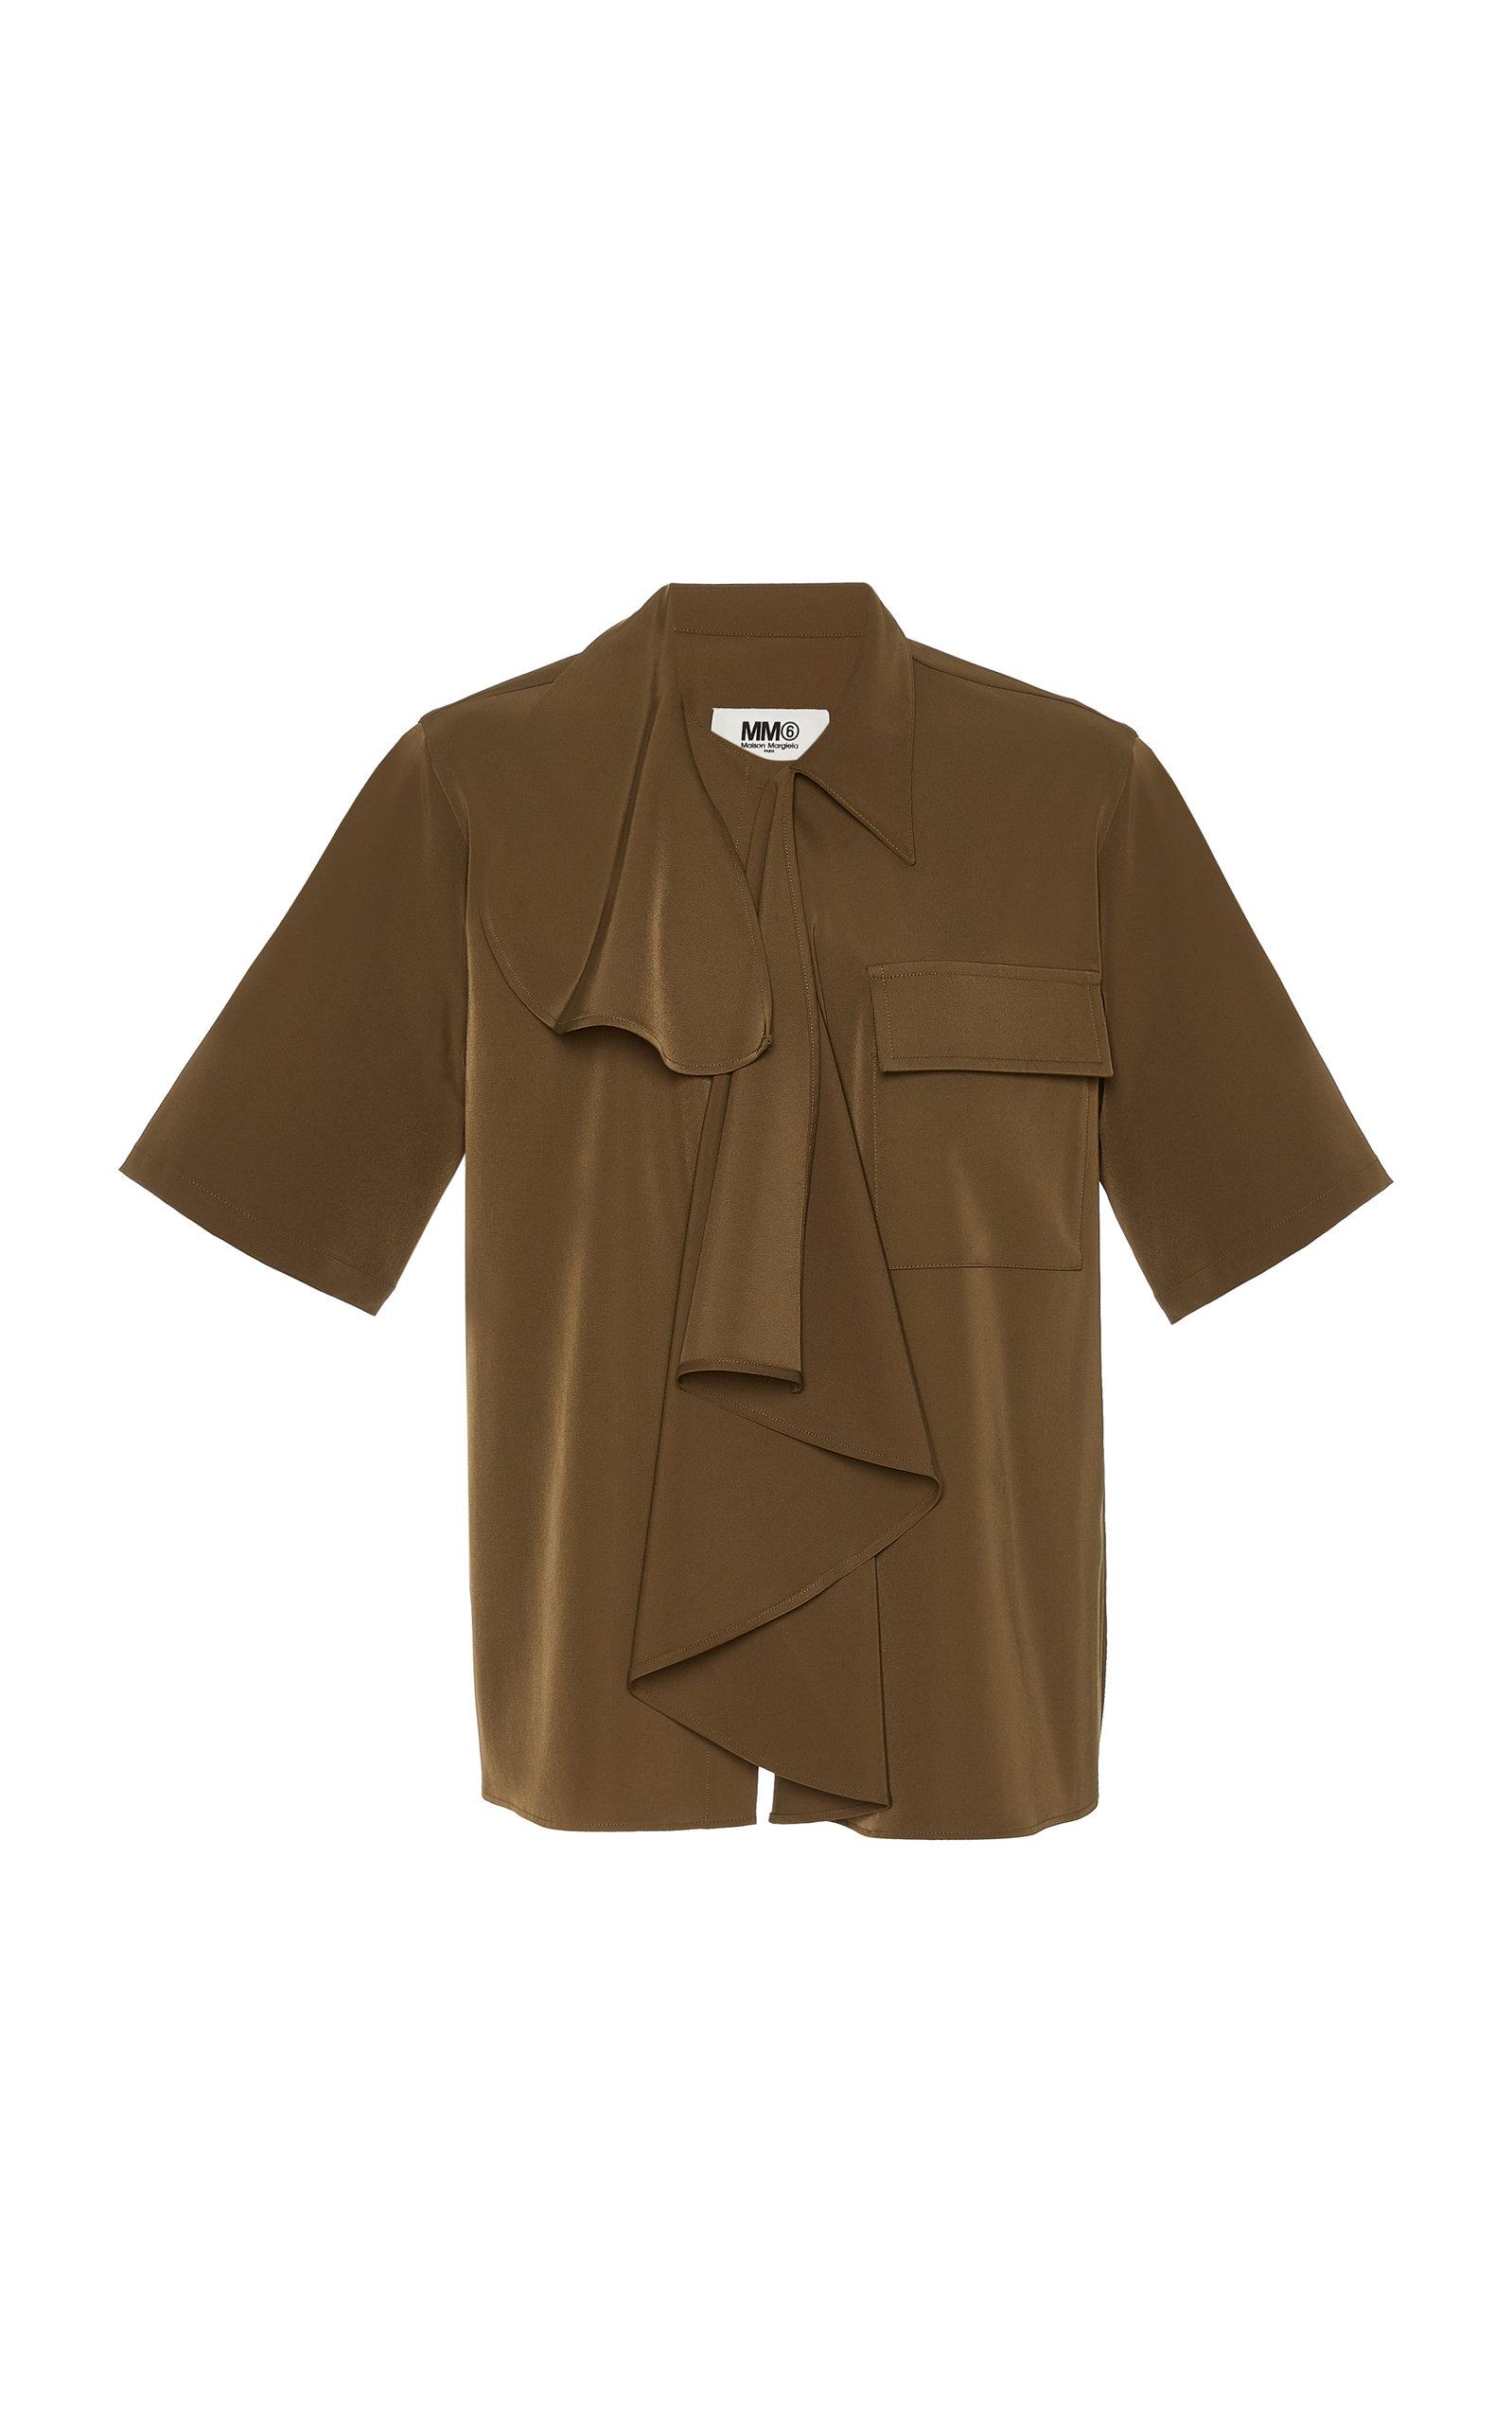 Mm6 Maison Margiela T-shirts DRAPED CREPE DE CHINE SHIRT